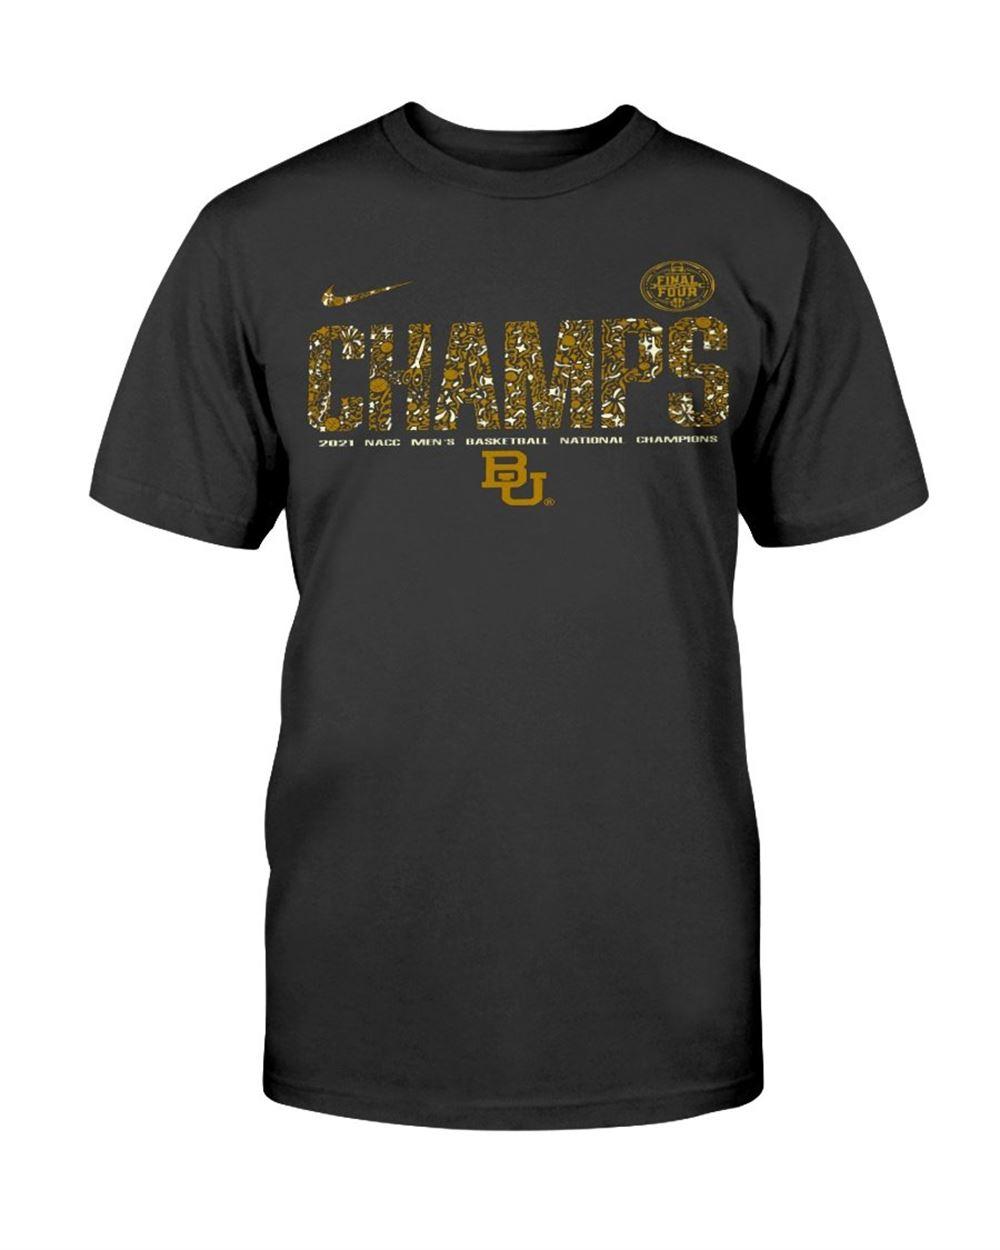 Amazing Tee National Champions Locker Room Shirt 100% Cotton